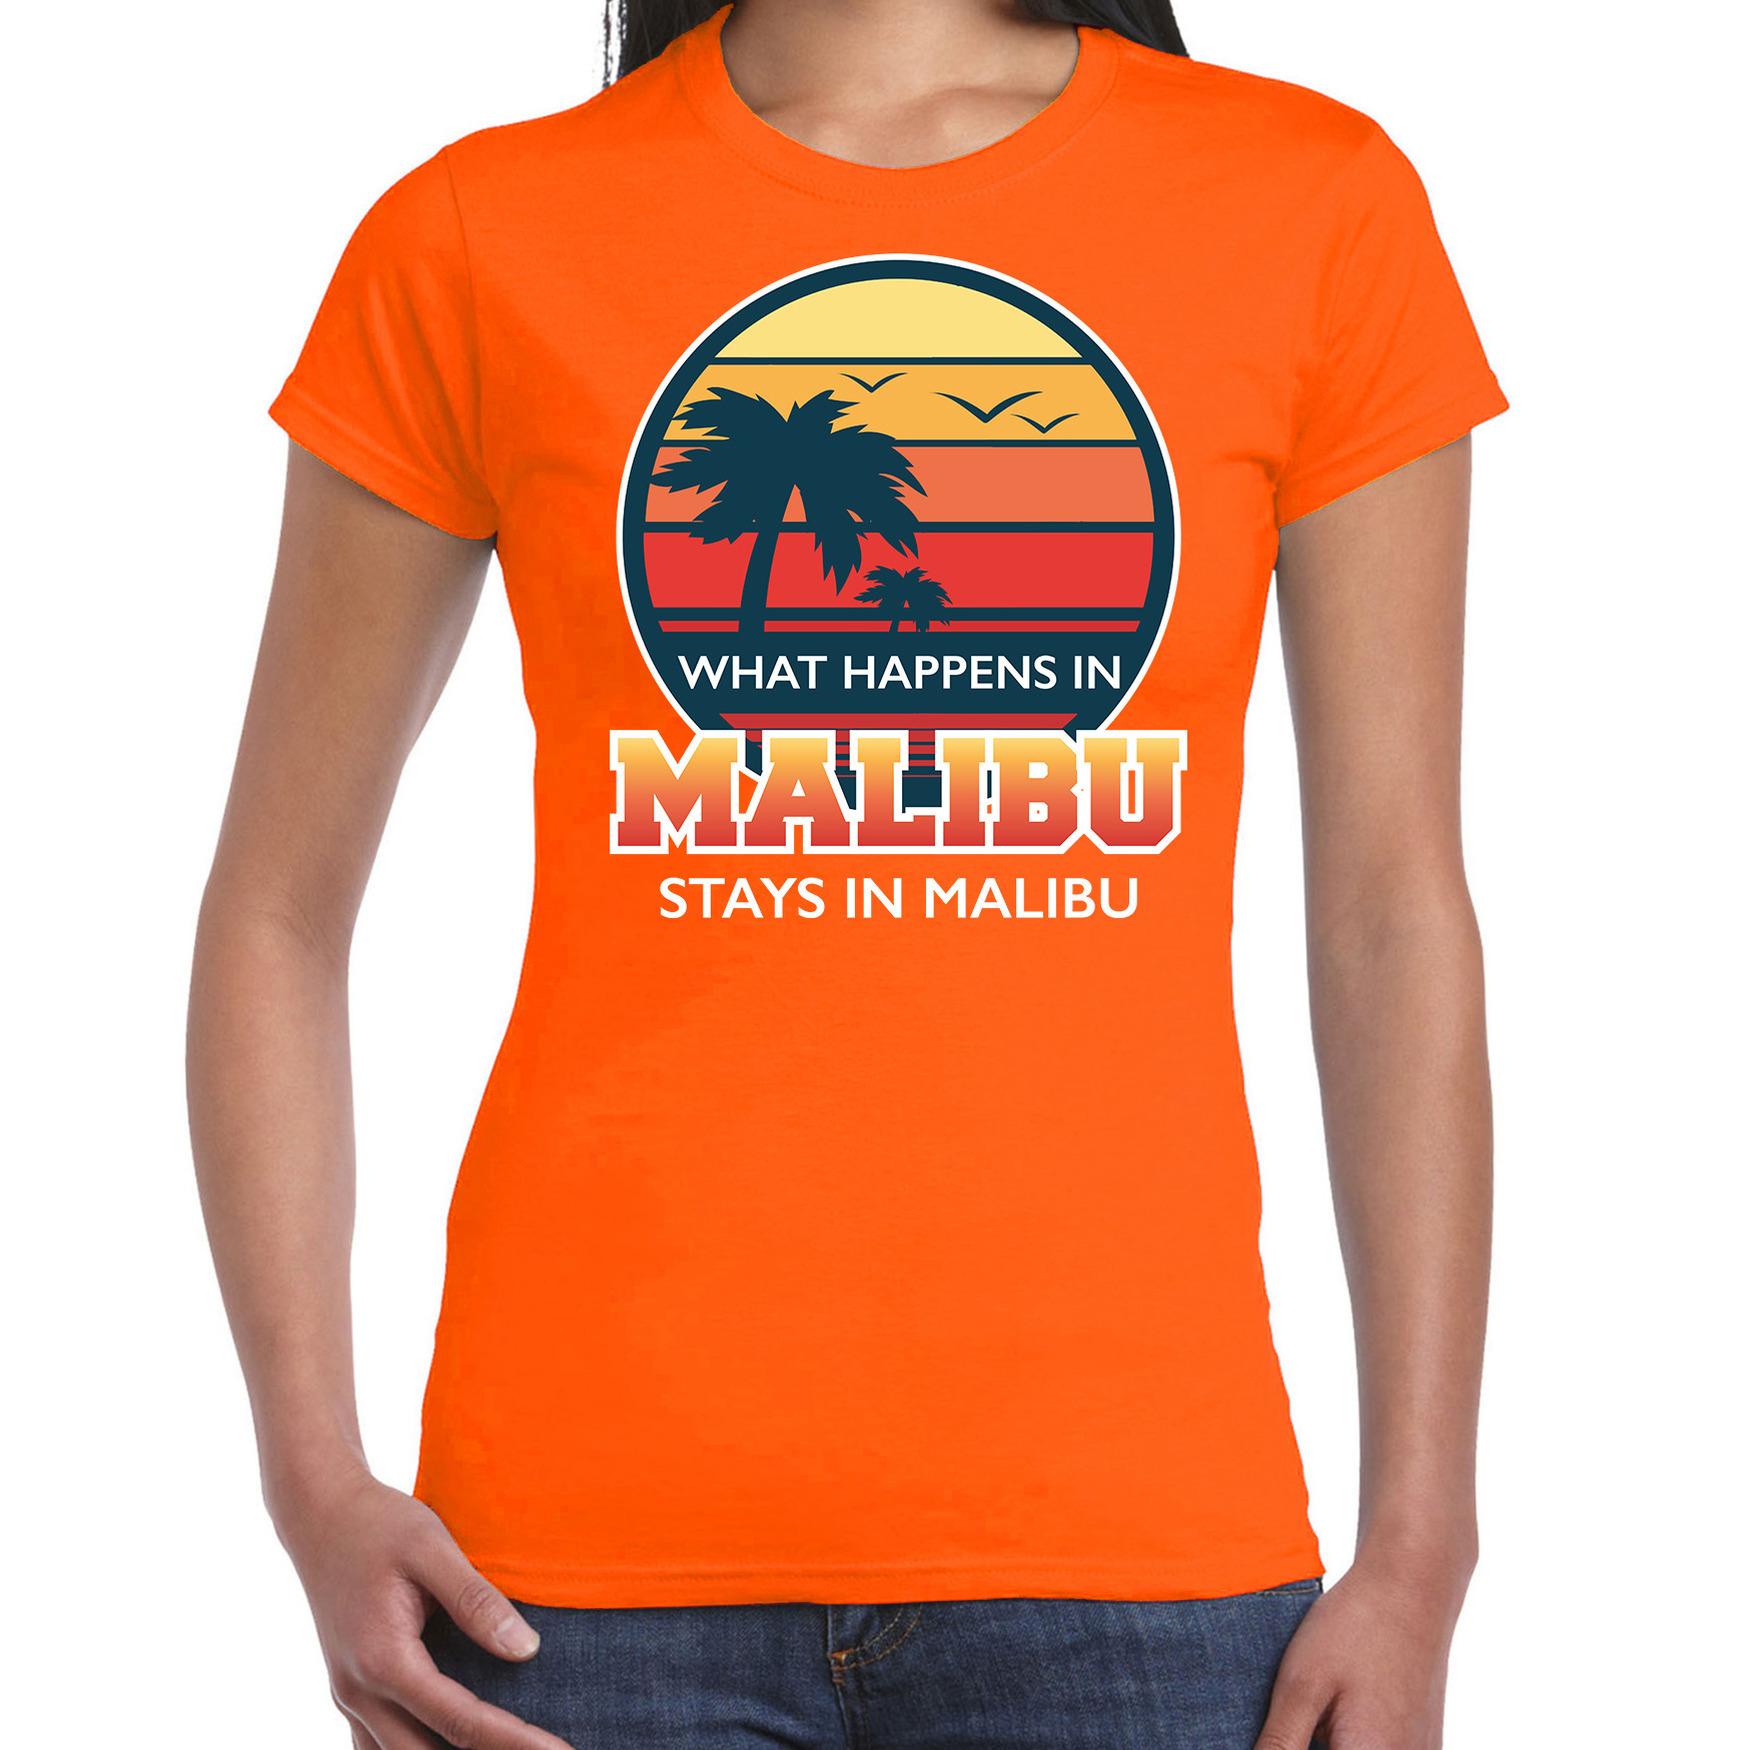 What happens in Malibu stays in Malibu shirt beach party - vakantie outfit - kleding oranje voor dam